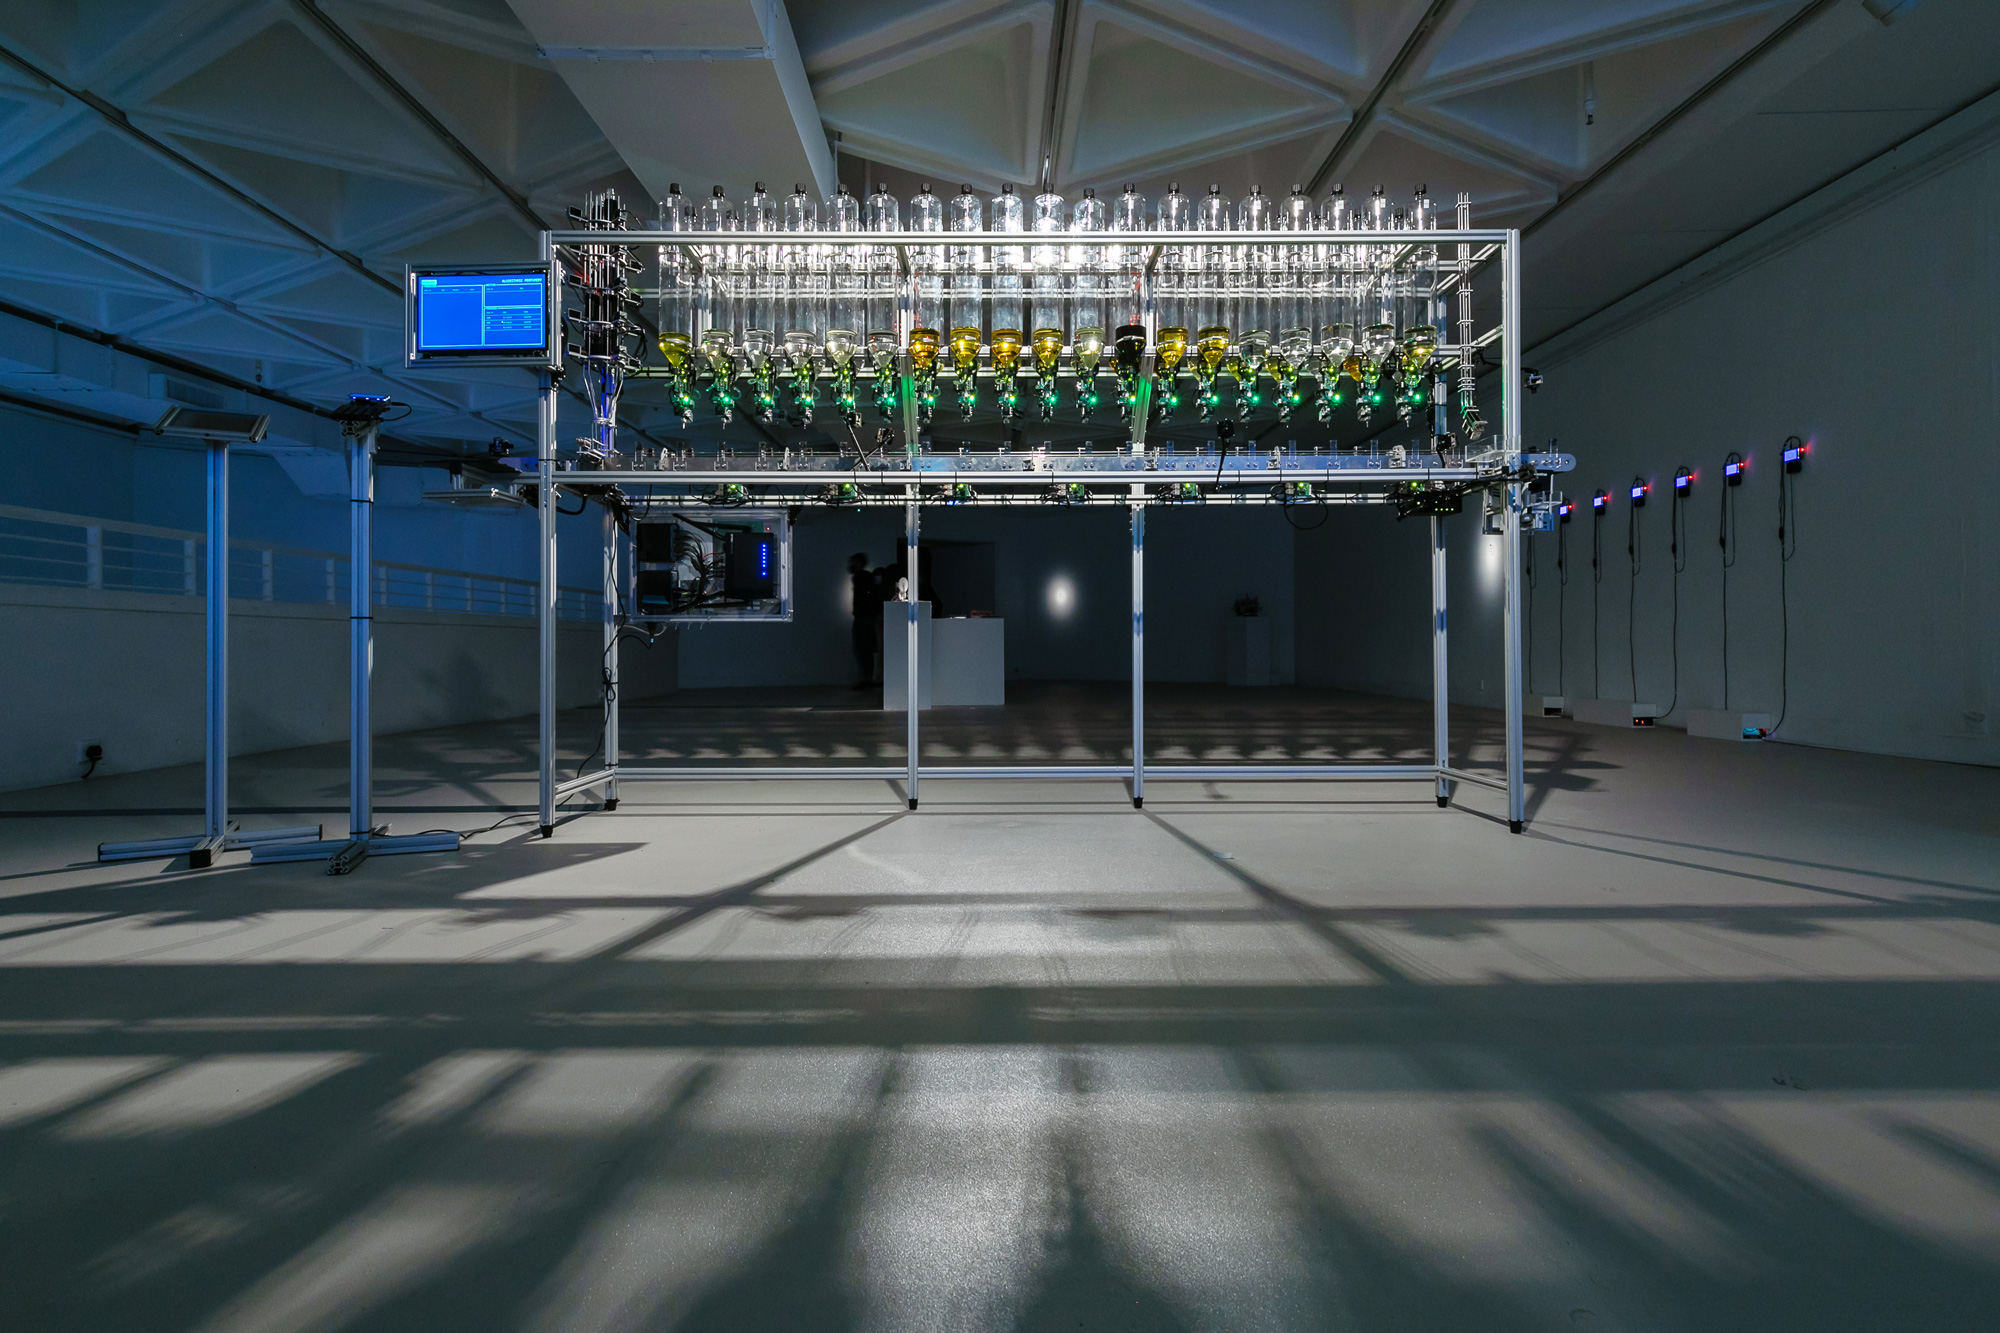 Algorithmic Perfumery by Frederik Duerinck (Netherlands)